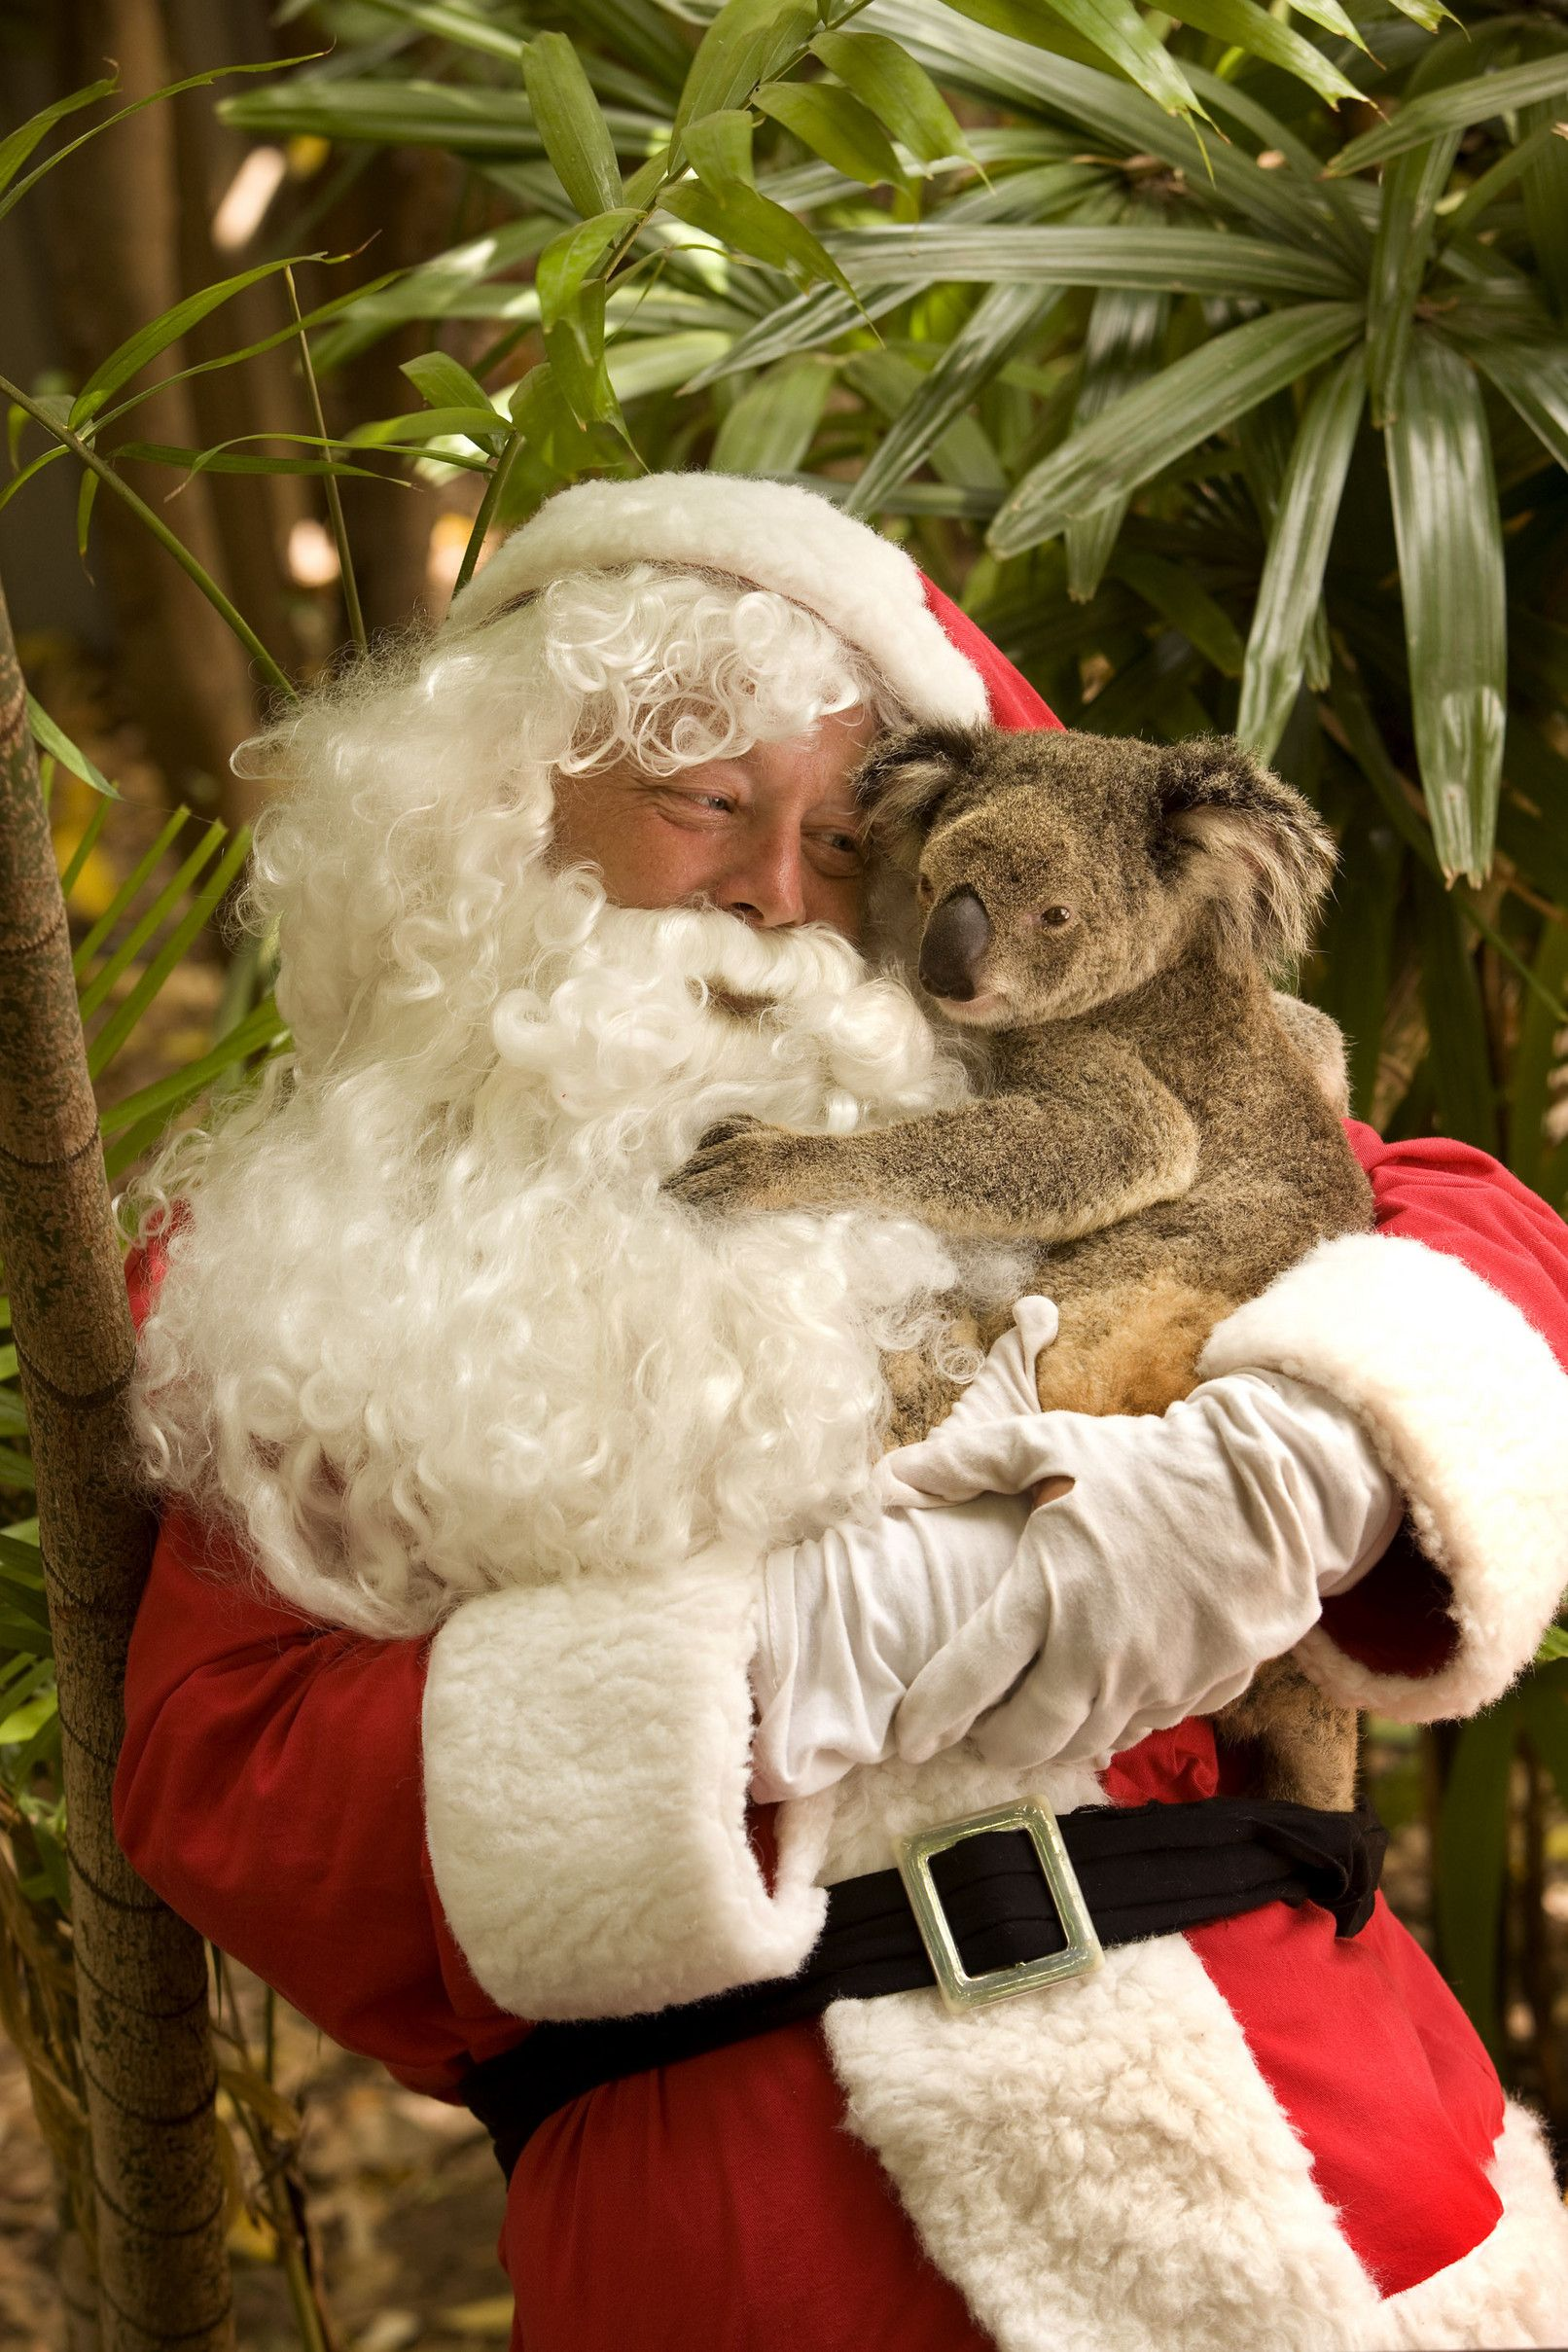 Australia Is Having Their Summer When Christmas Arrives